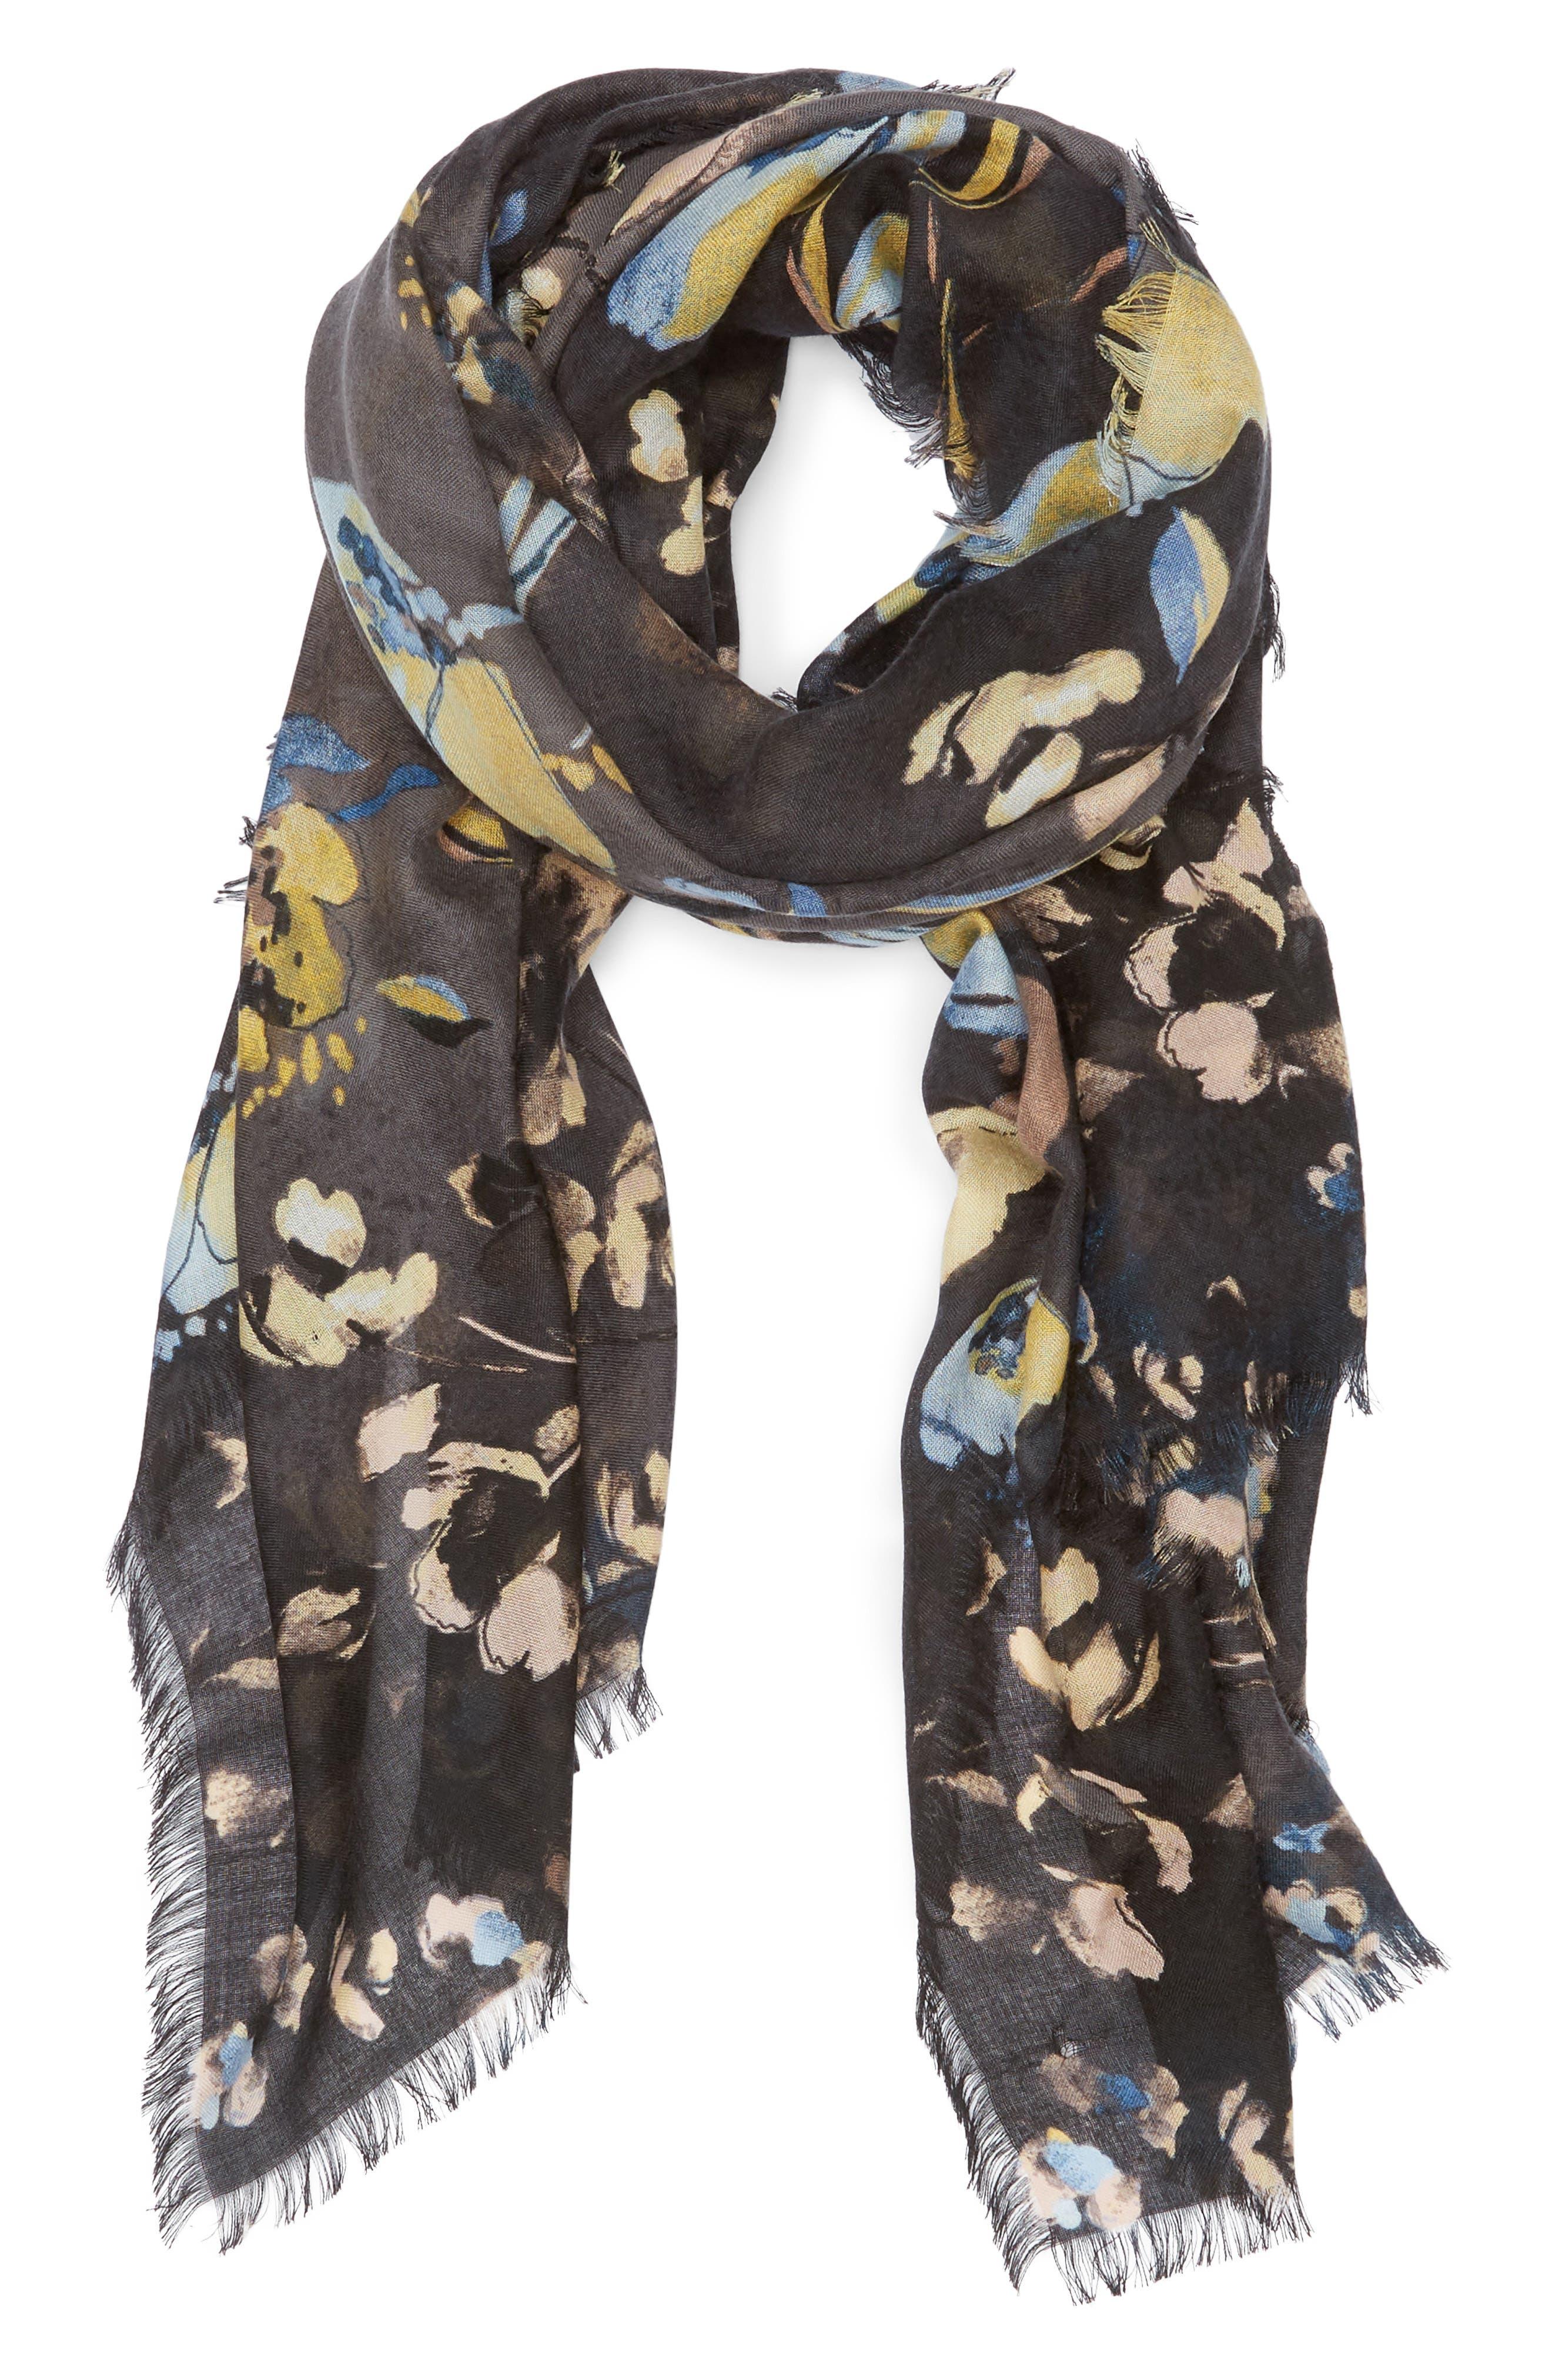 Eyelash Trim Print Cashmere & Silk Wrap,                             Alternate thumbnail 2, color,                             BLACK VINE FLORAL